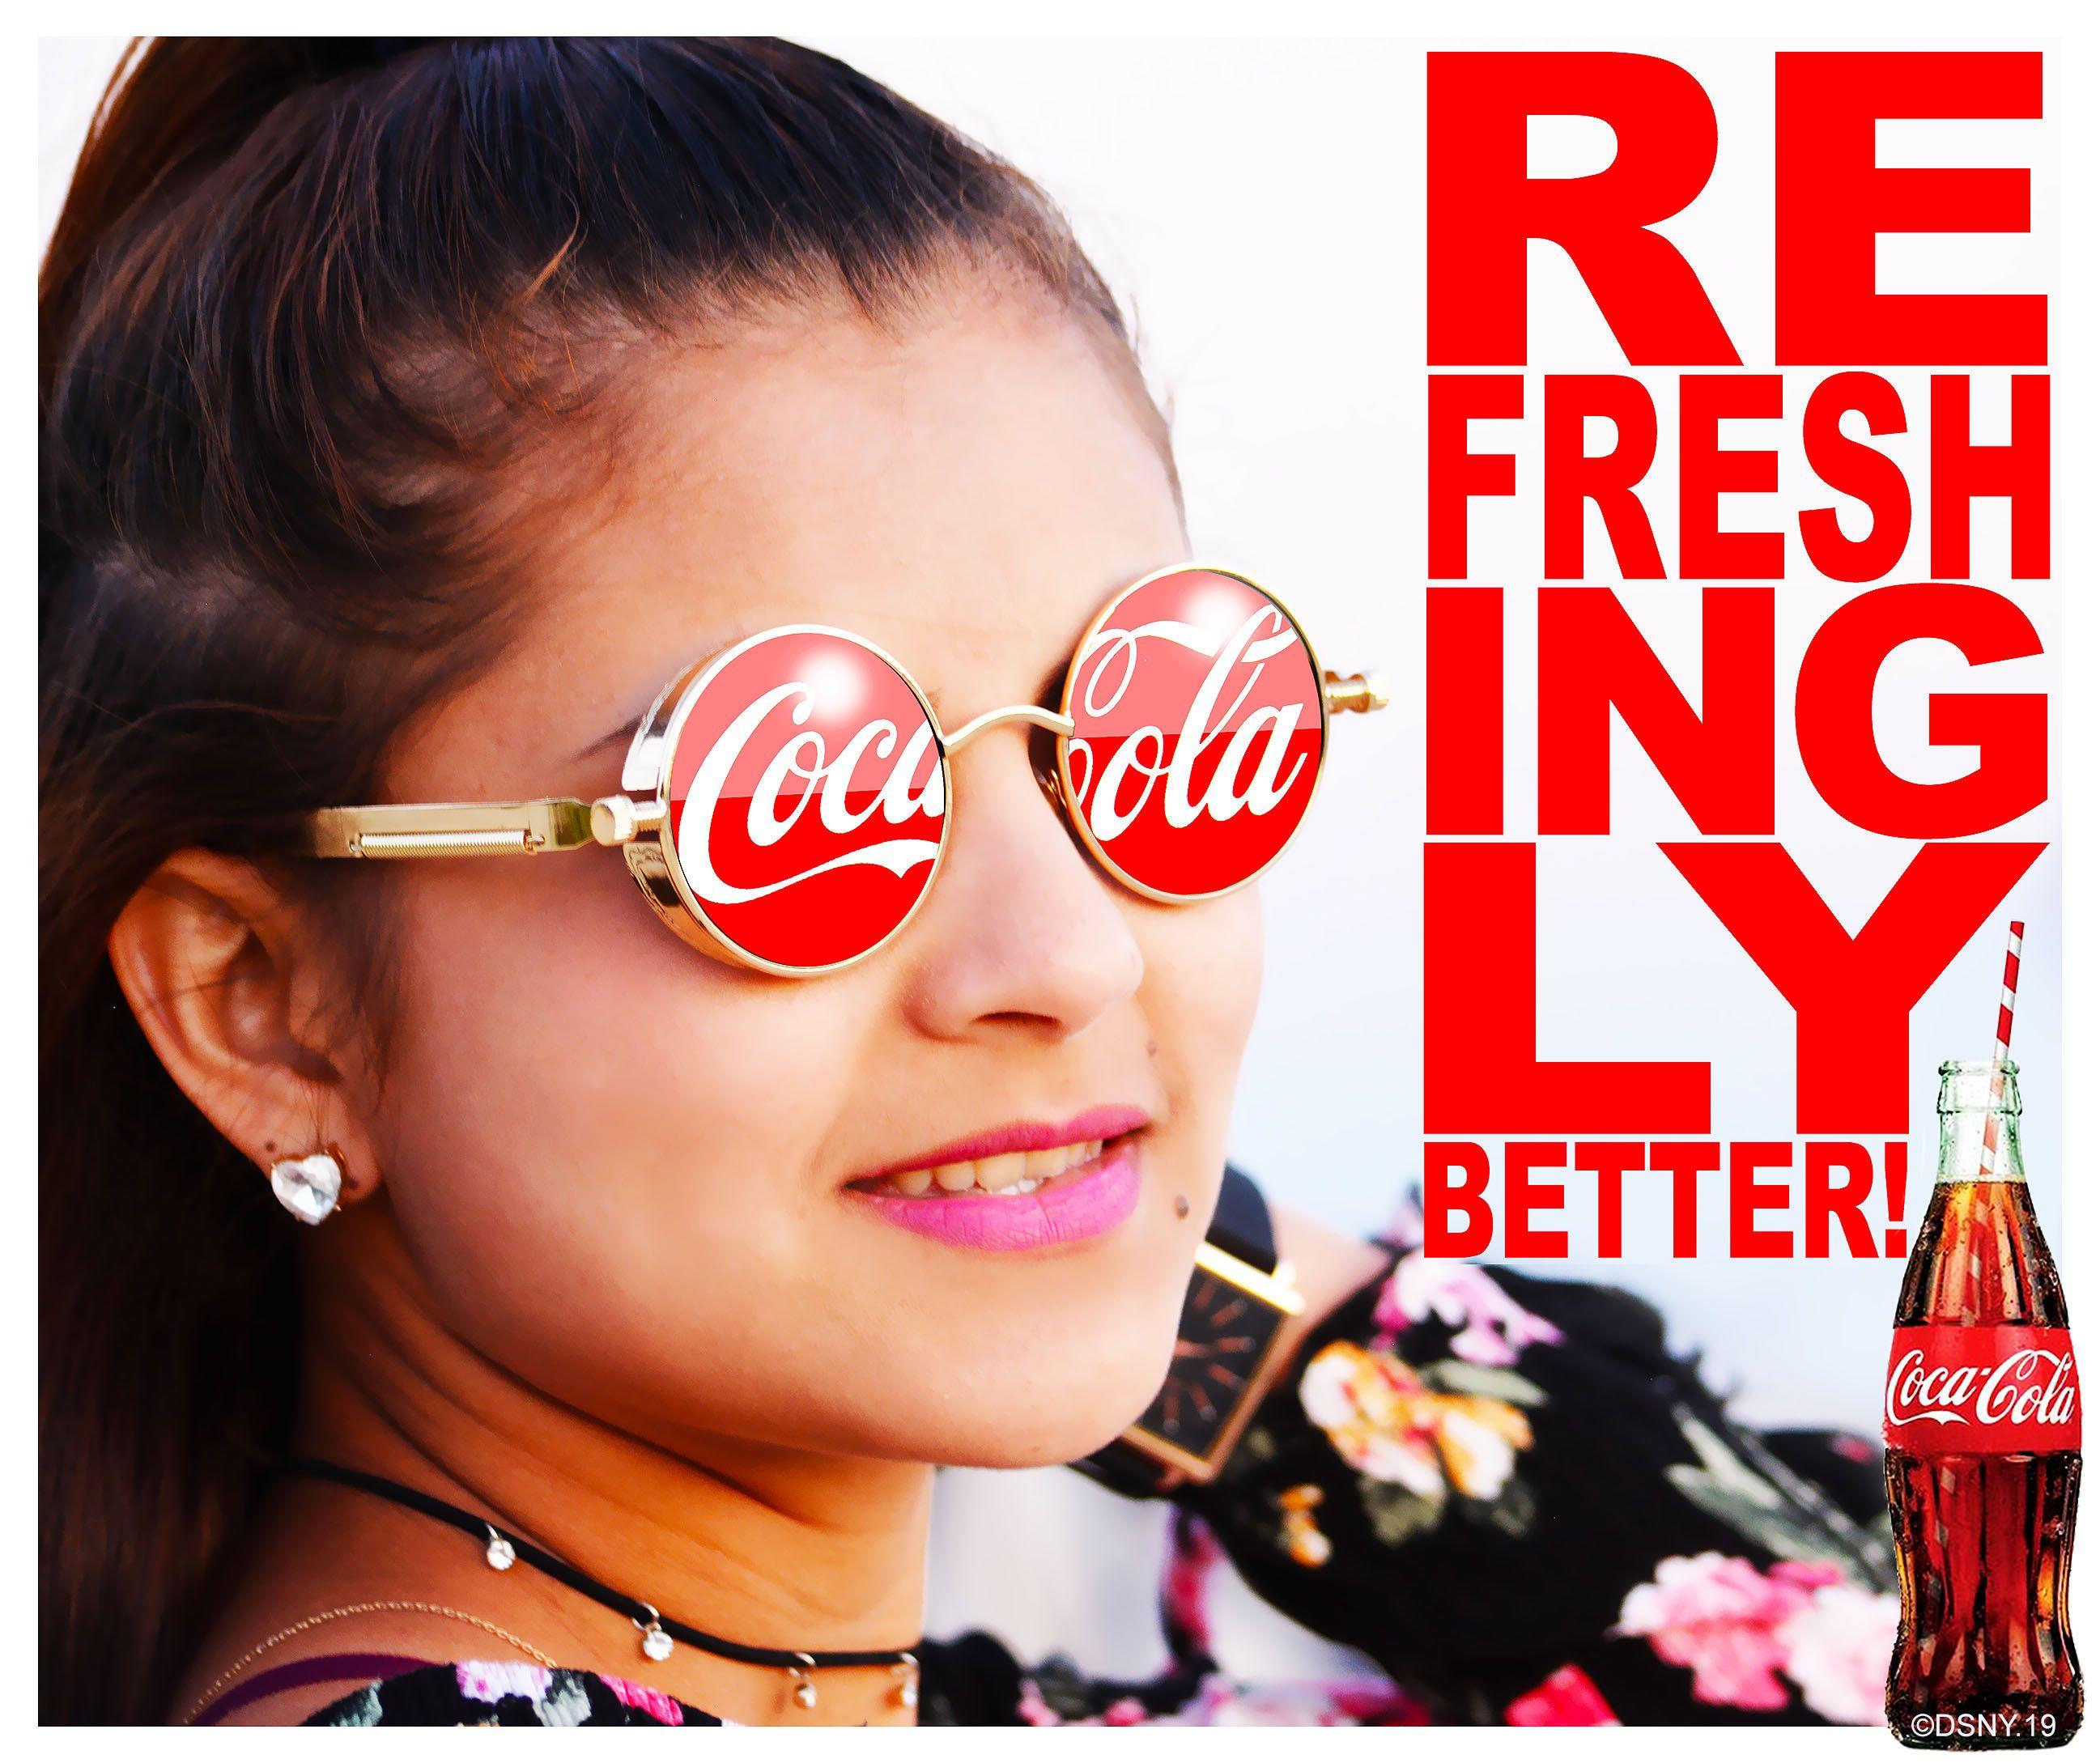 Coca-Cola Girl, Coke Girl, Coca-Cola Bottle, Coke Bottle